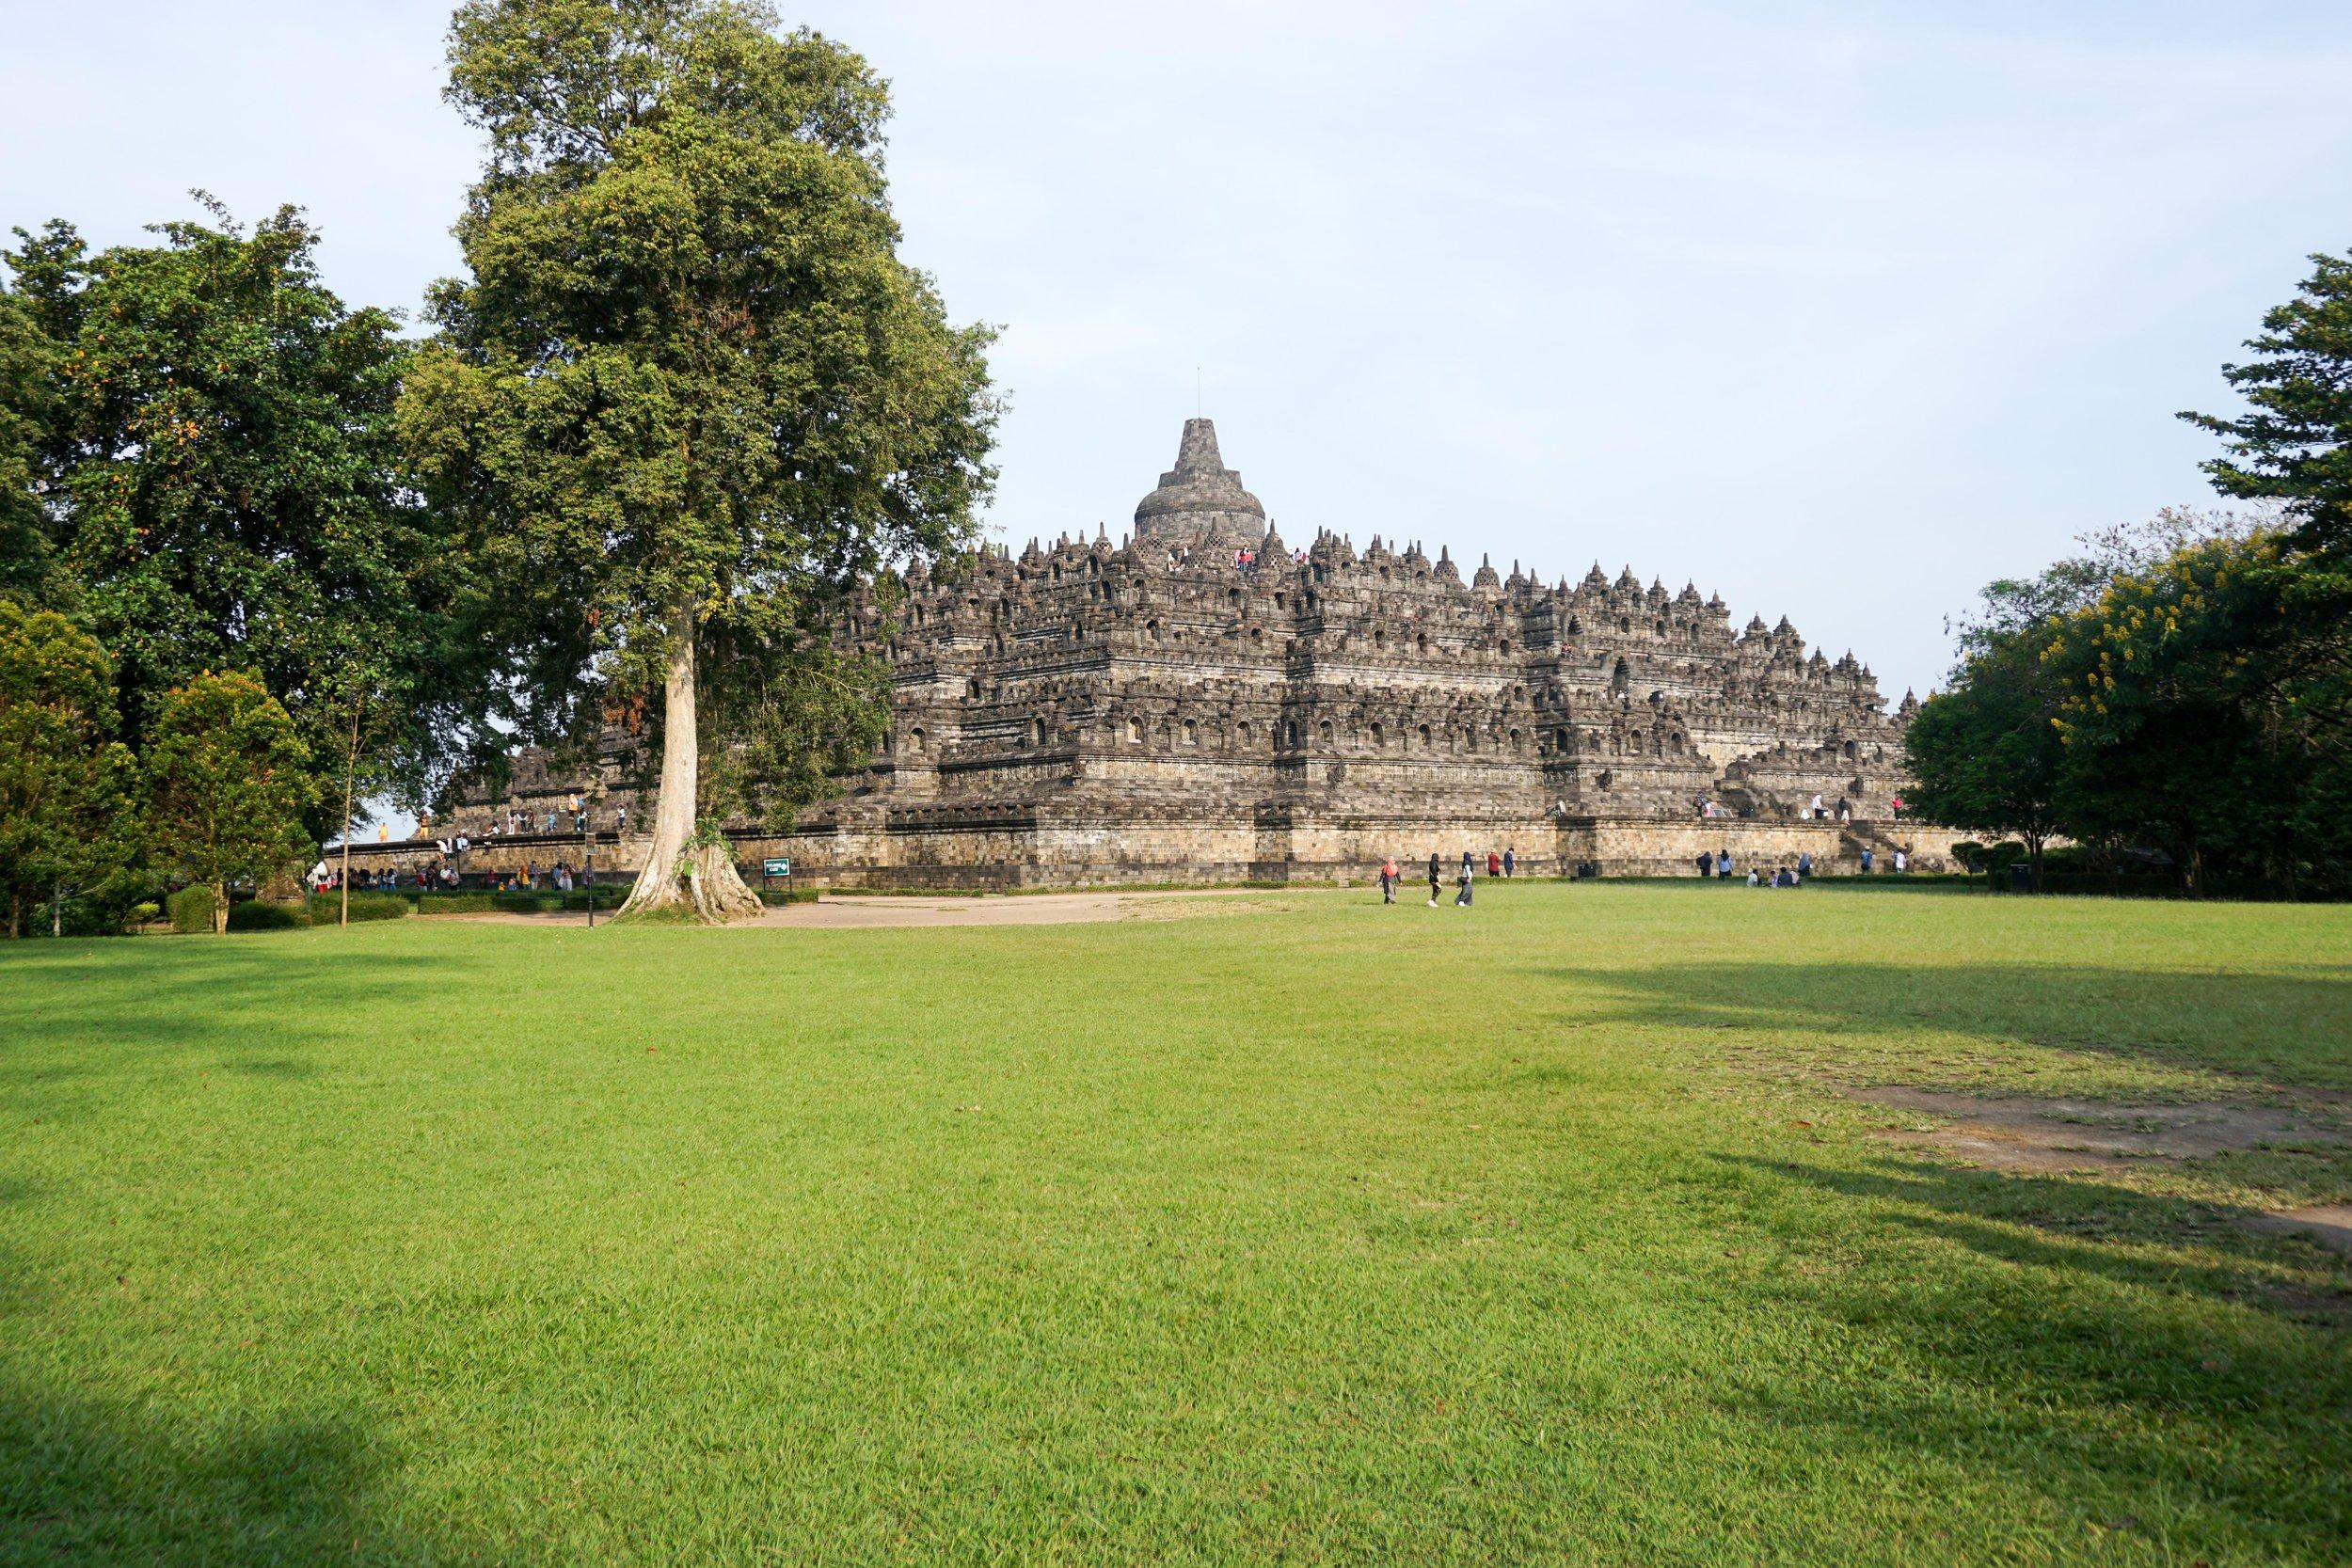 Borobudur from afar